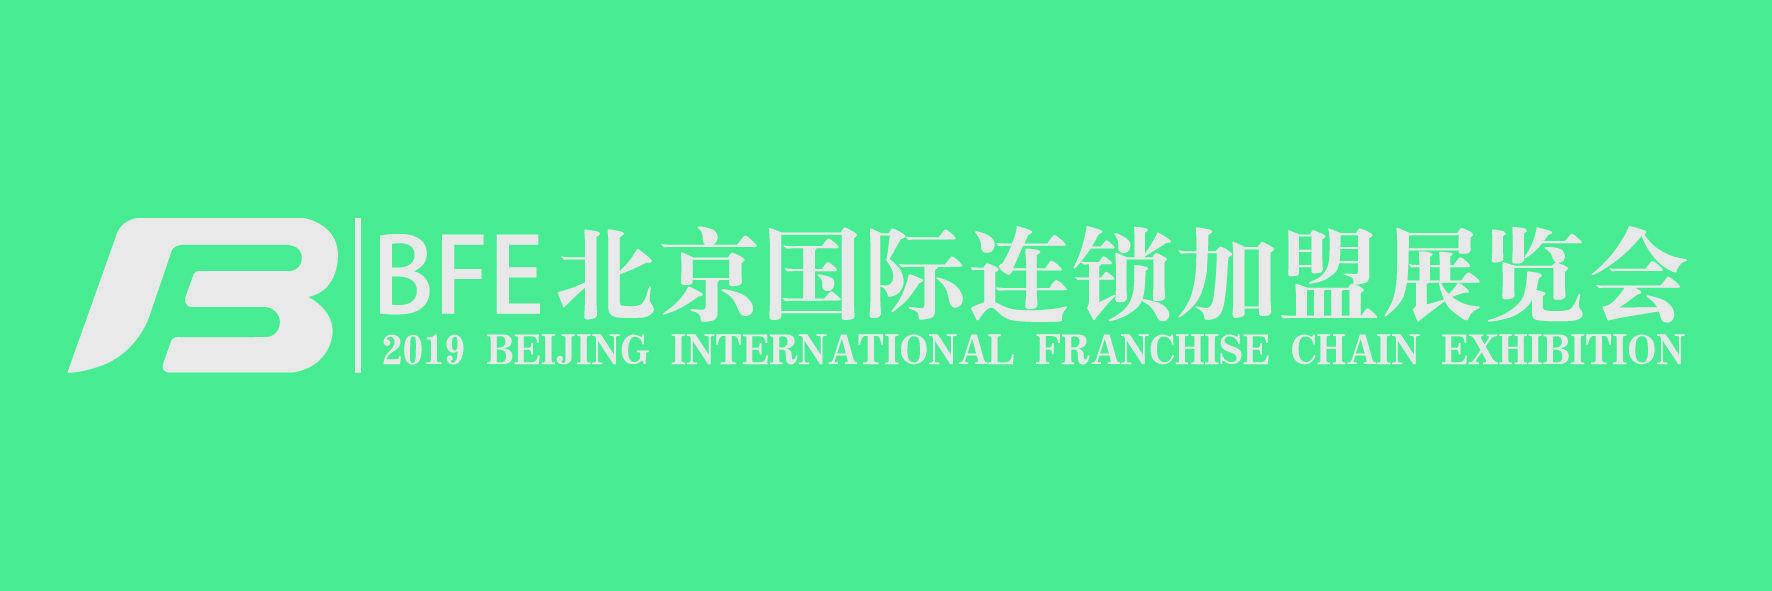 BFE北京加盟展logo-01.jpg